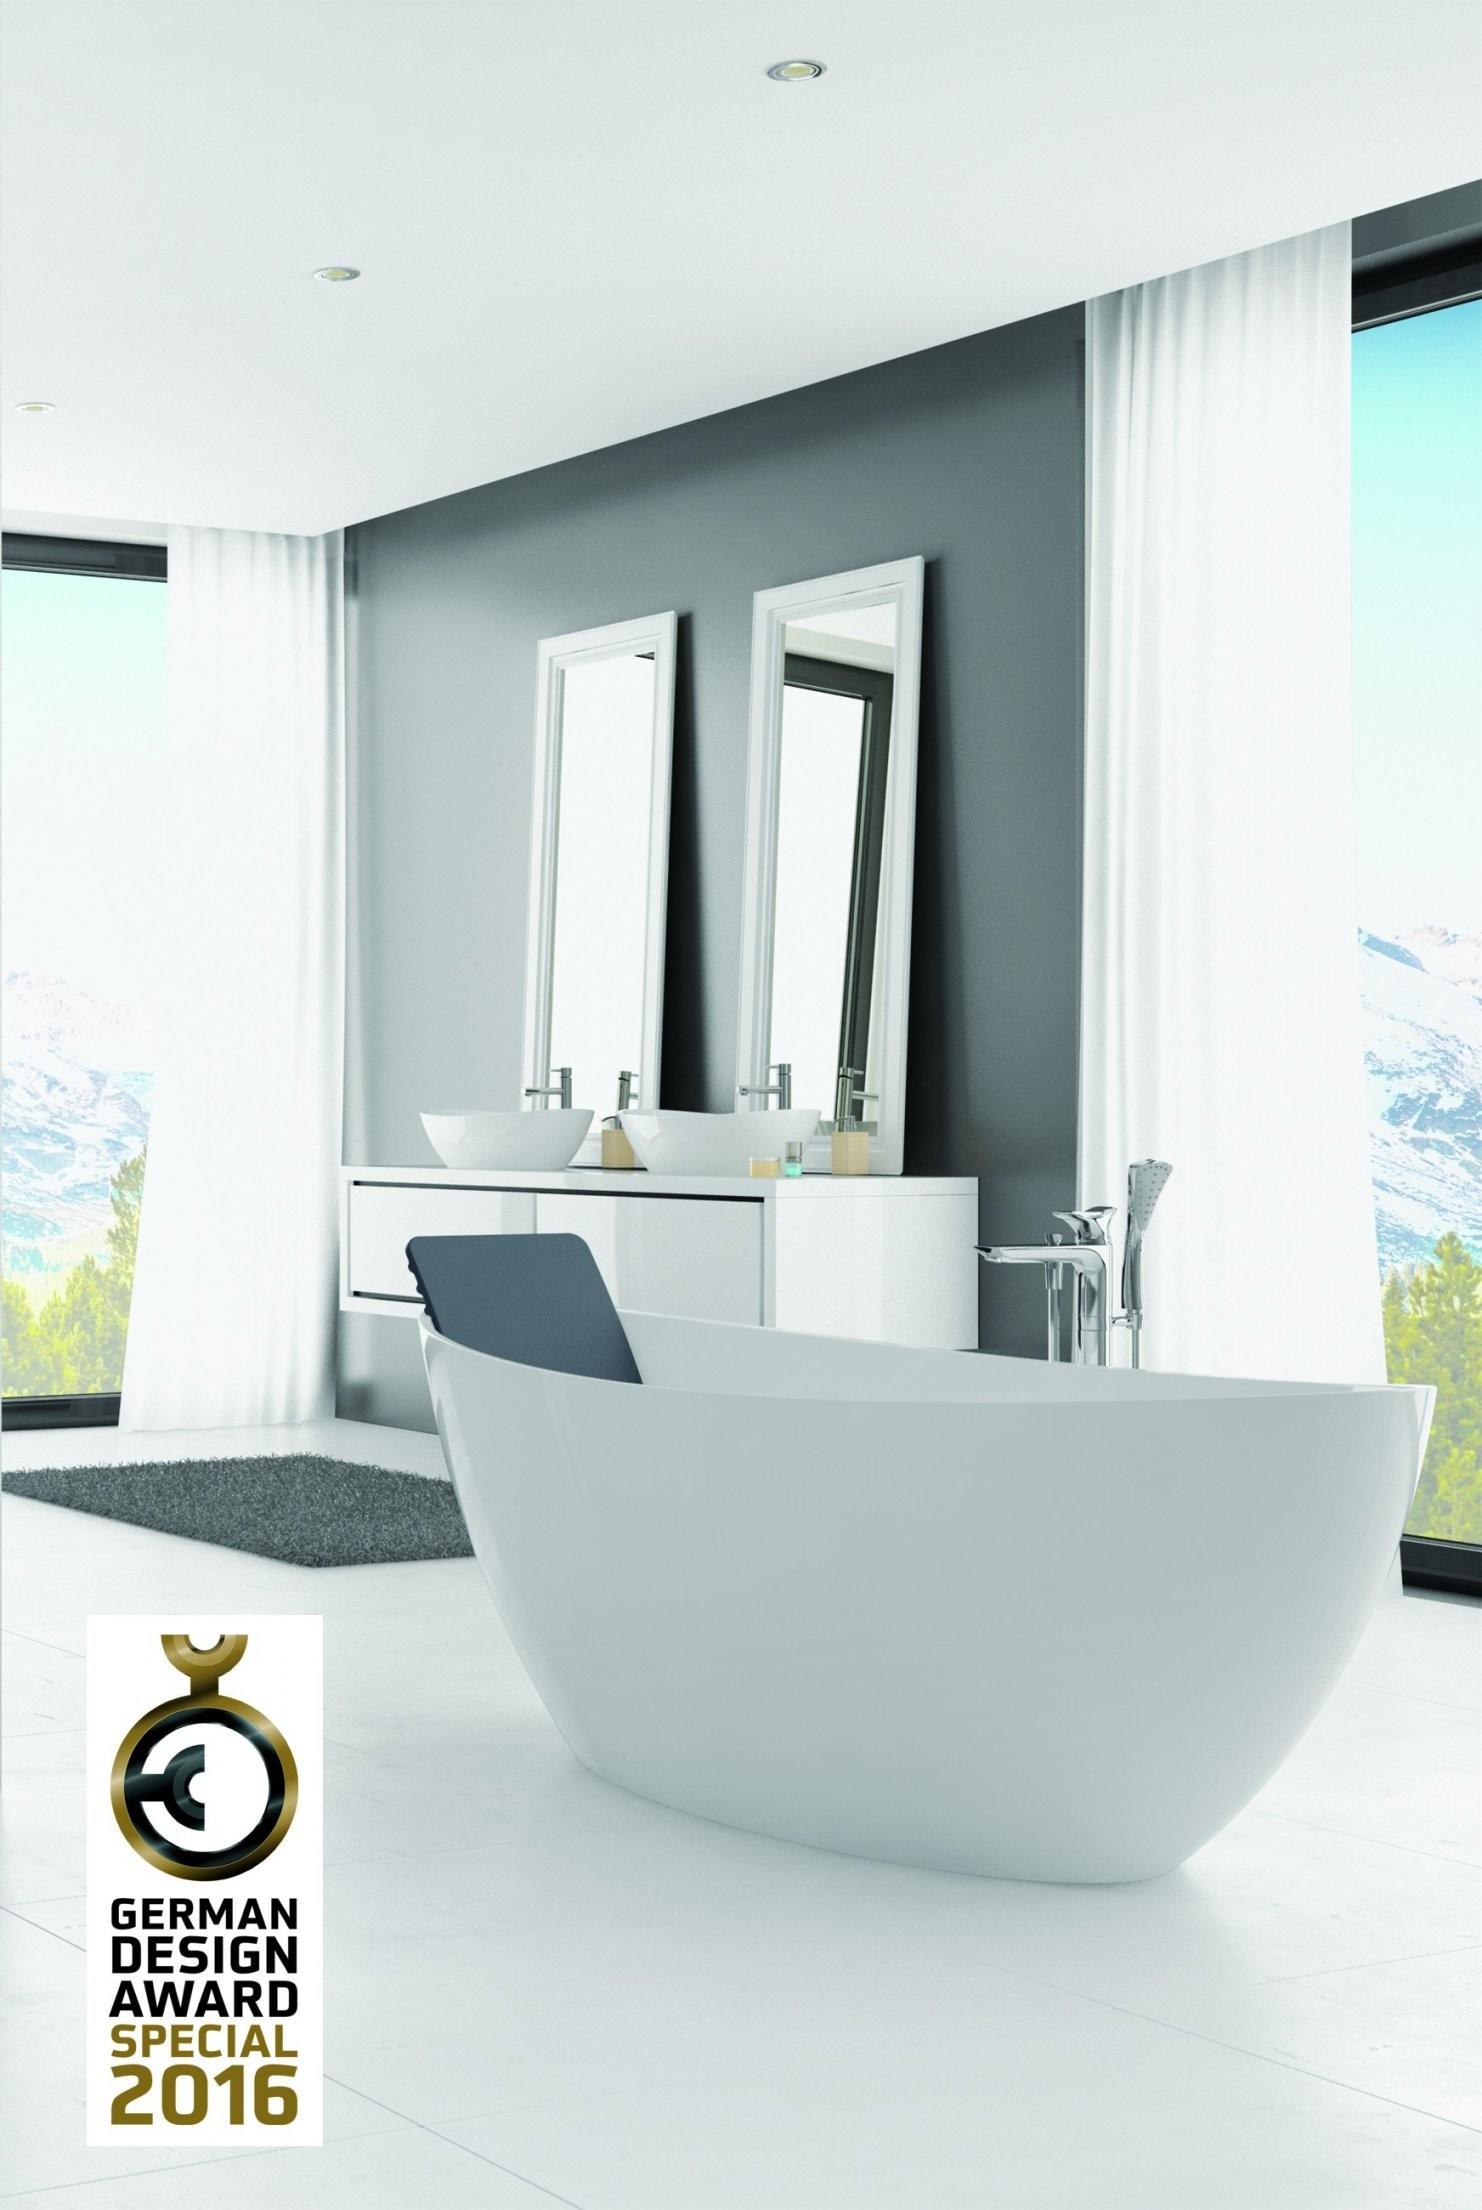 Hoesch Badewanne Namur 1800X800 Freistehend Material Solique Weiß von Freistehende Badewanne Hoesch Bild